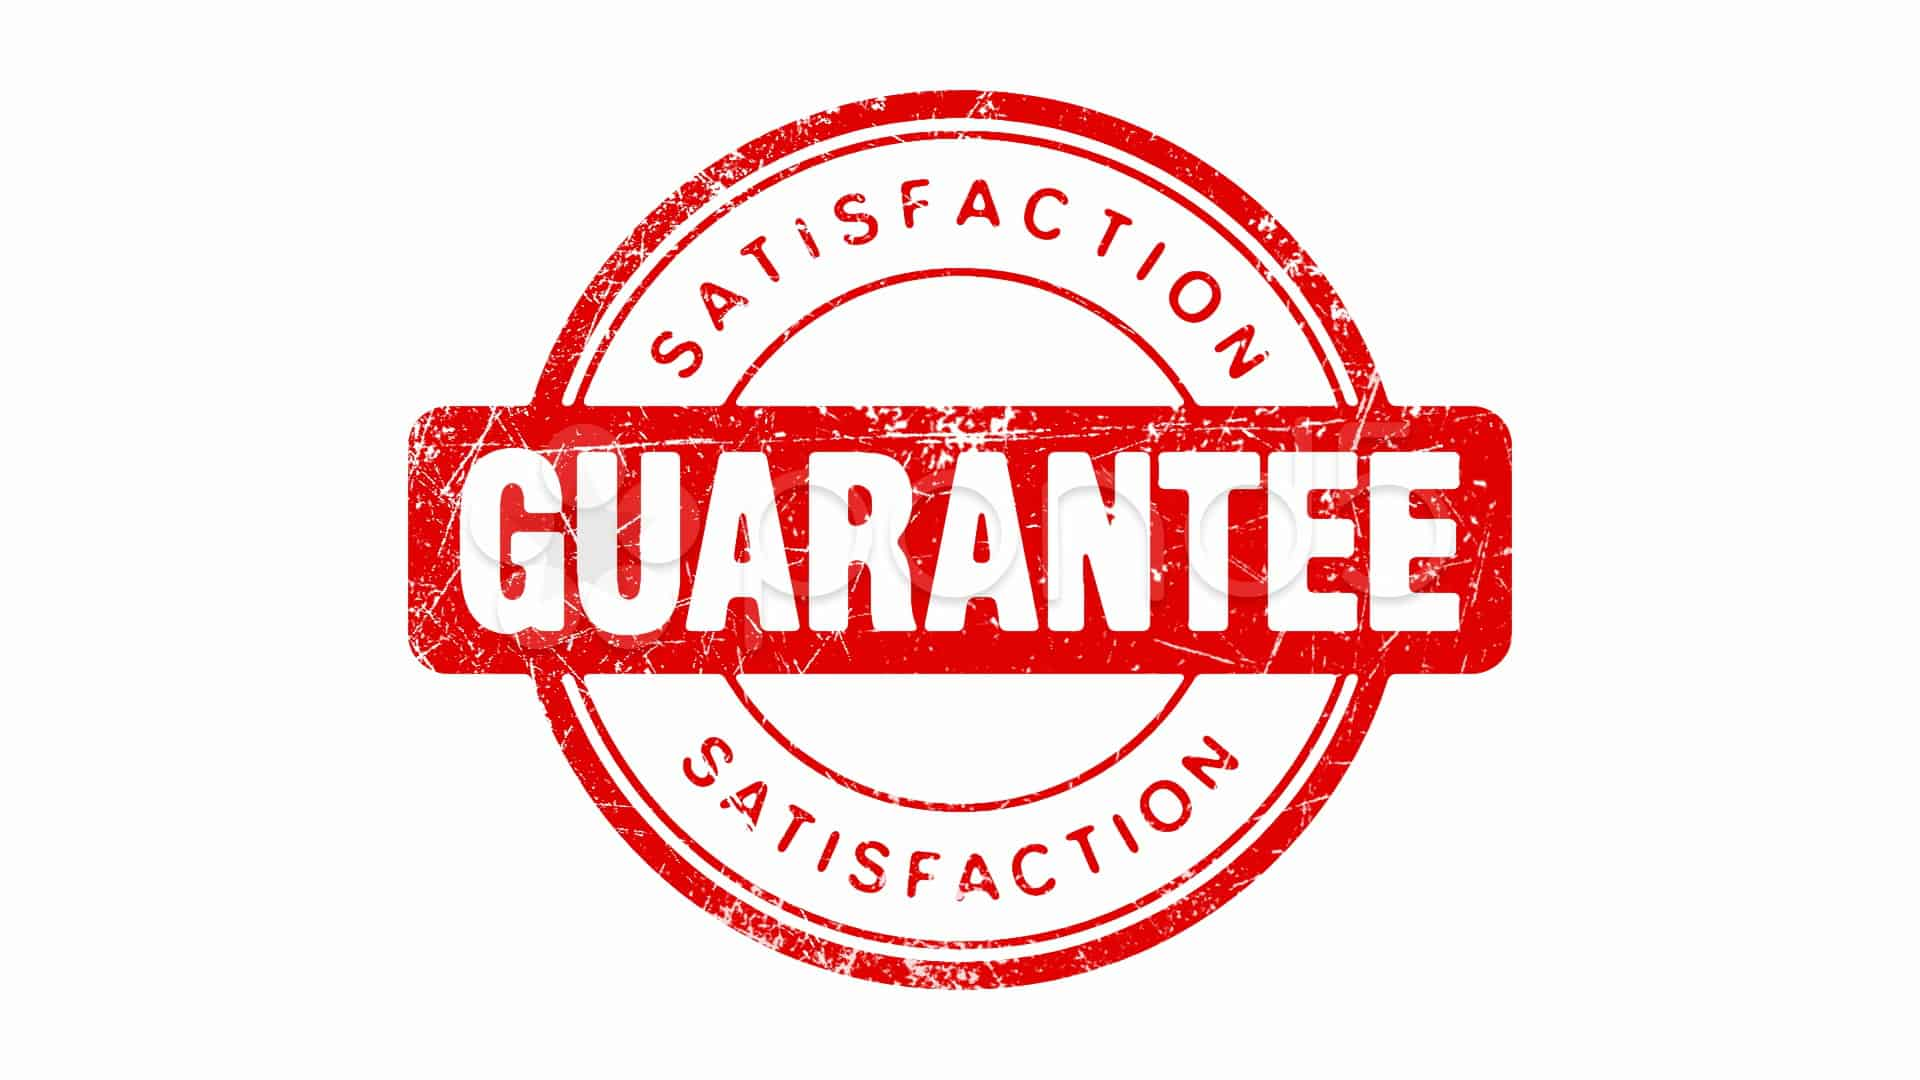 satisfaction guranteed